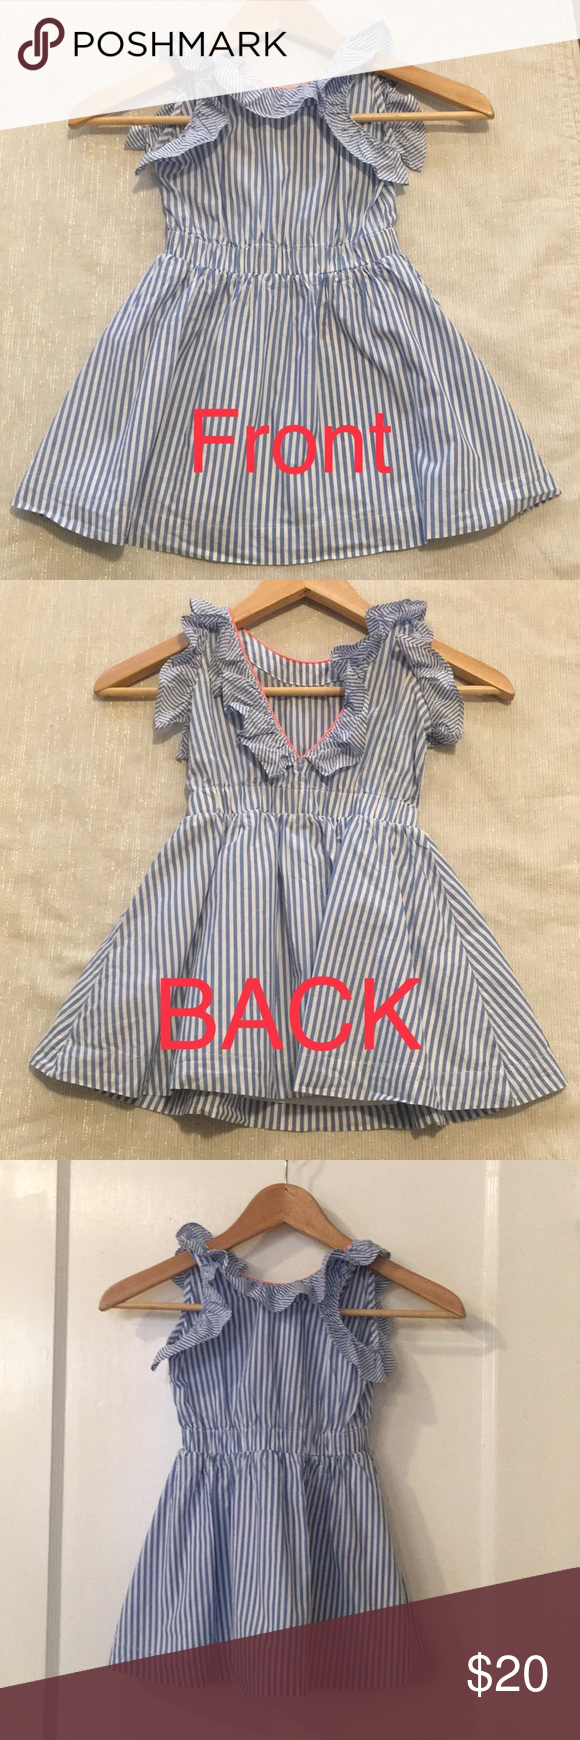 Jcrew 3t Summer Dress Summer Dresses Dresses Crew Dress [ 1740 x 580 Pixel ]